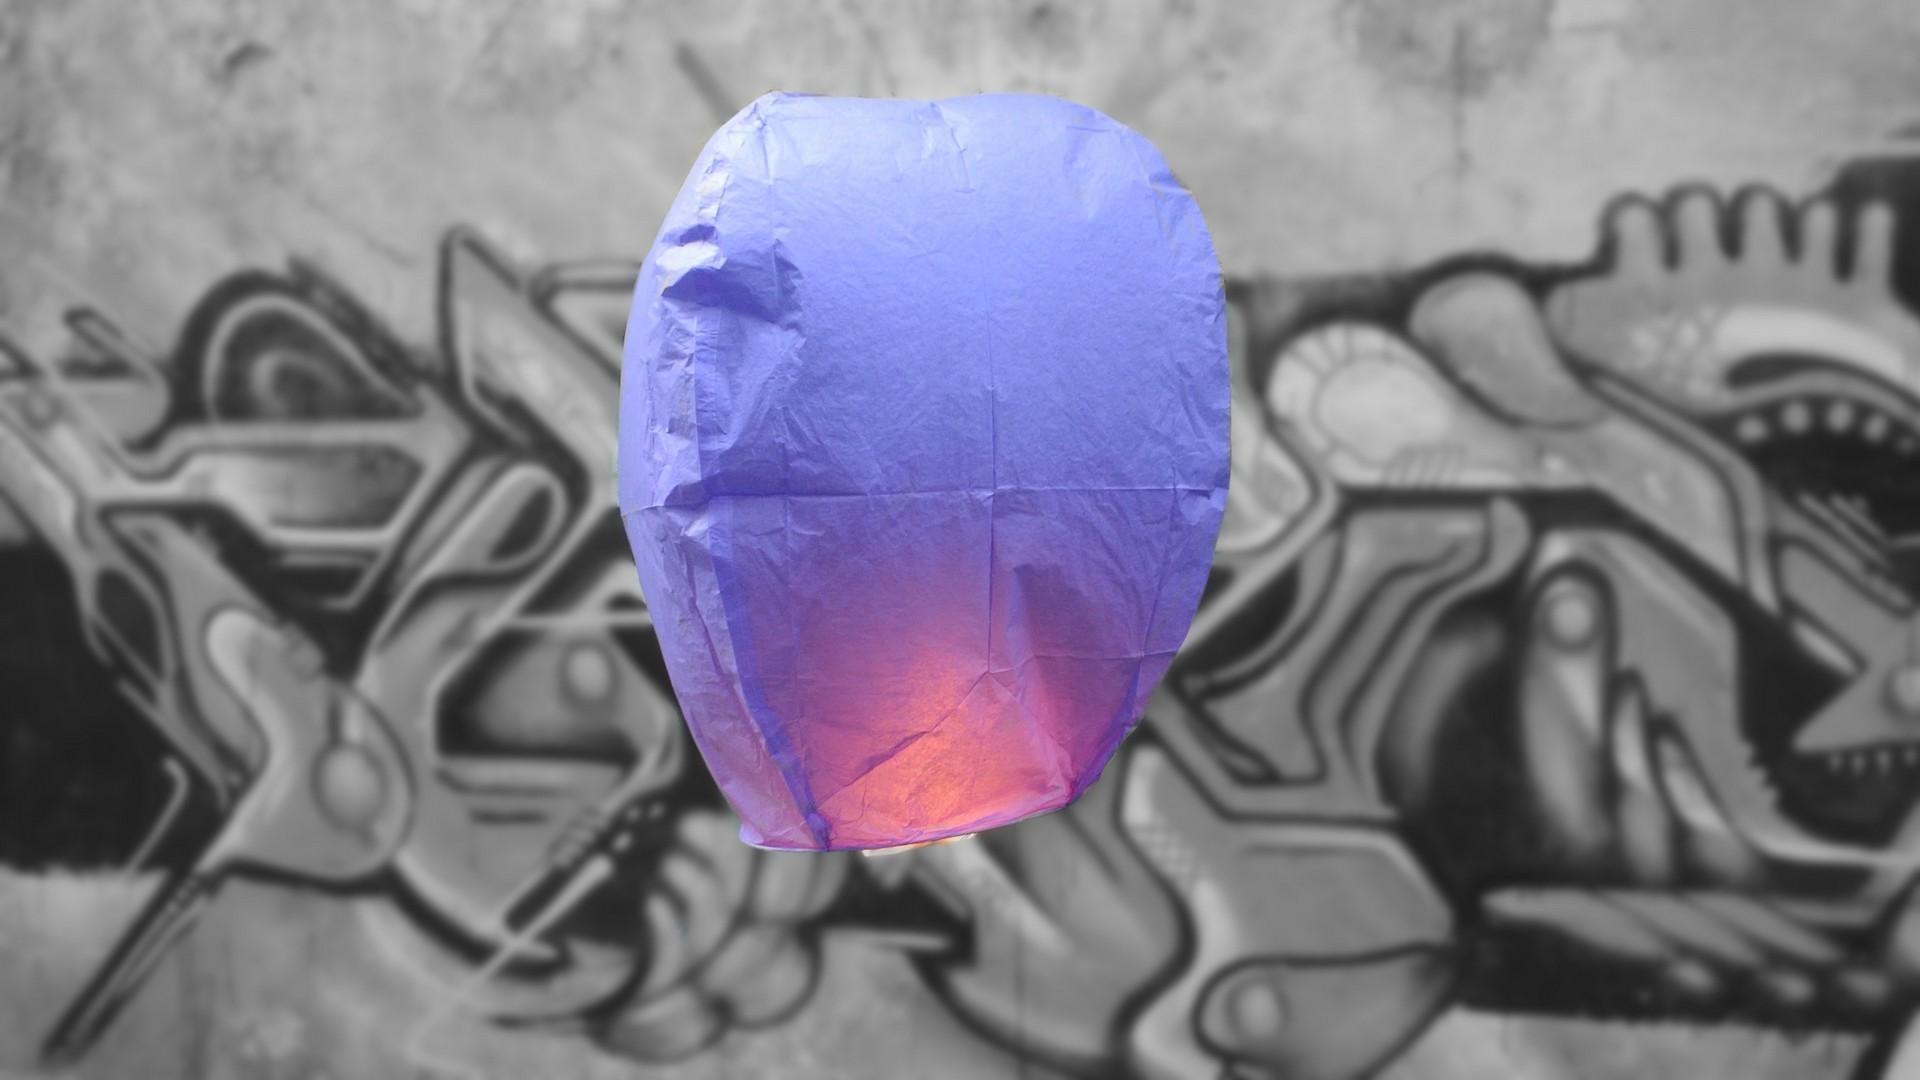 Paarse Wens Ballon - Vliegende Lantaarns Professioneel